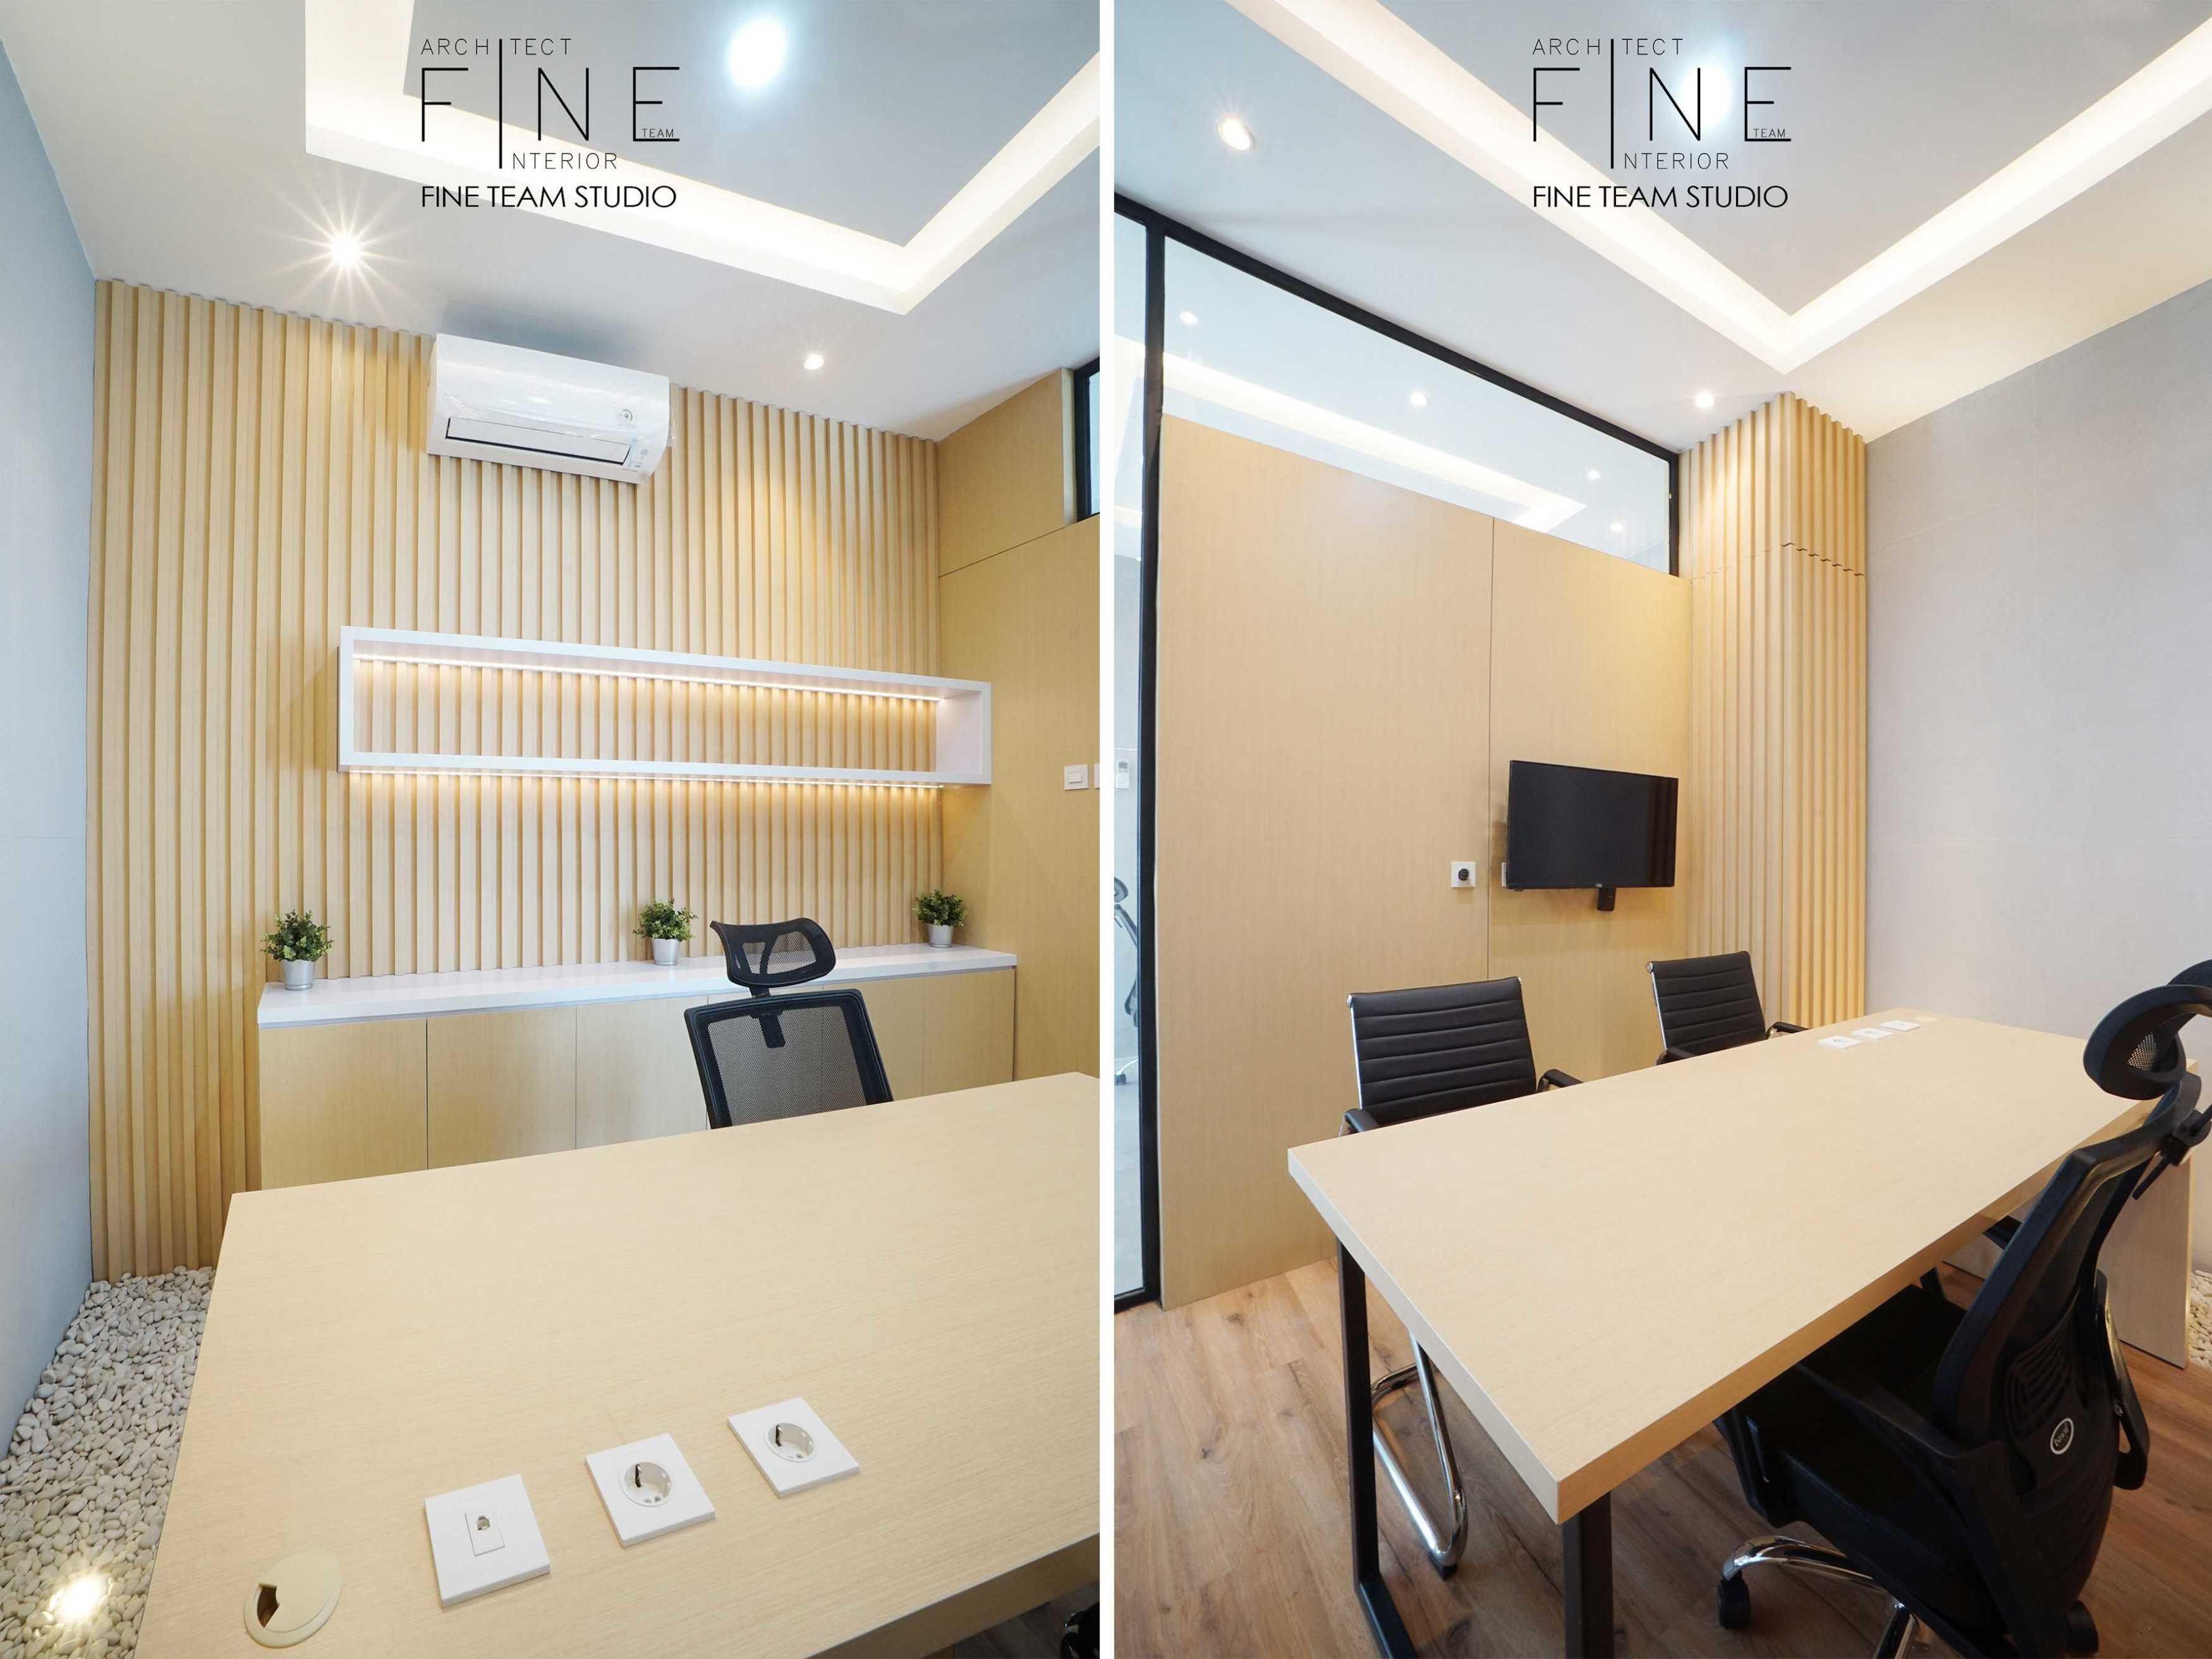 Fine Team Studio Mob Office Cikupa, Tangerang, Banten, Indonesia Cikupa, Tangerang, Banten, Indonesia Fine-Team-Studio-Mob-Office   71132